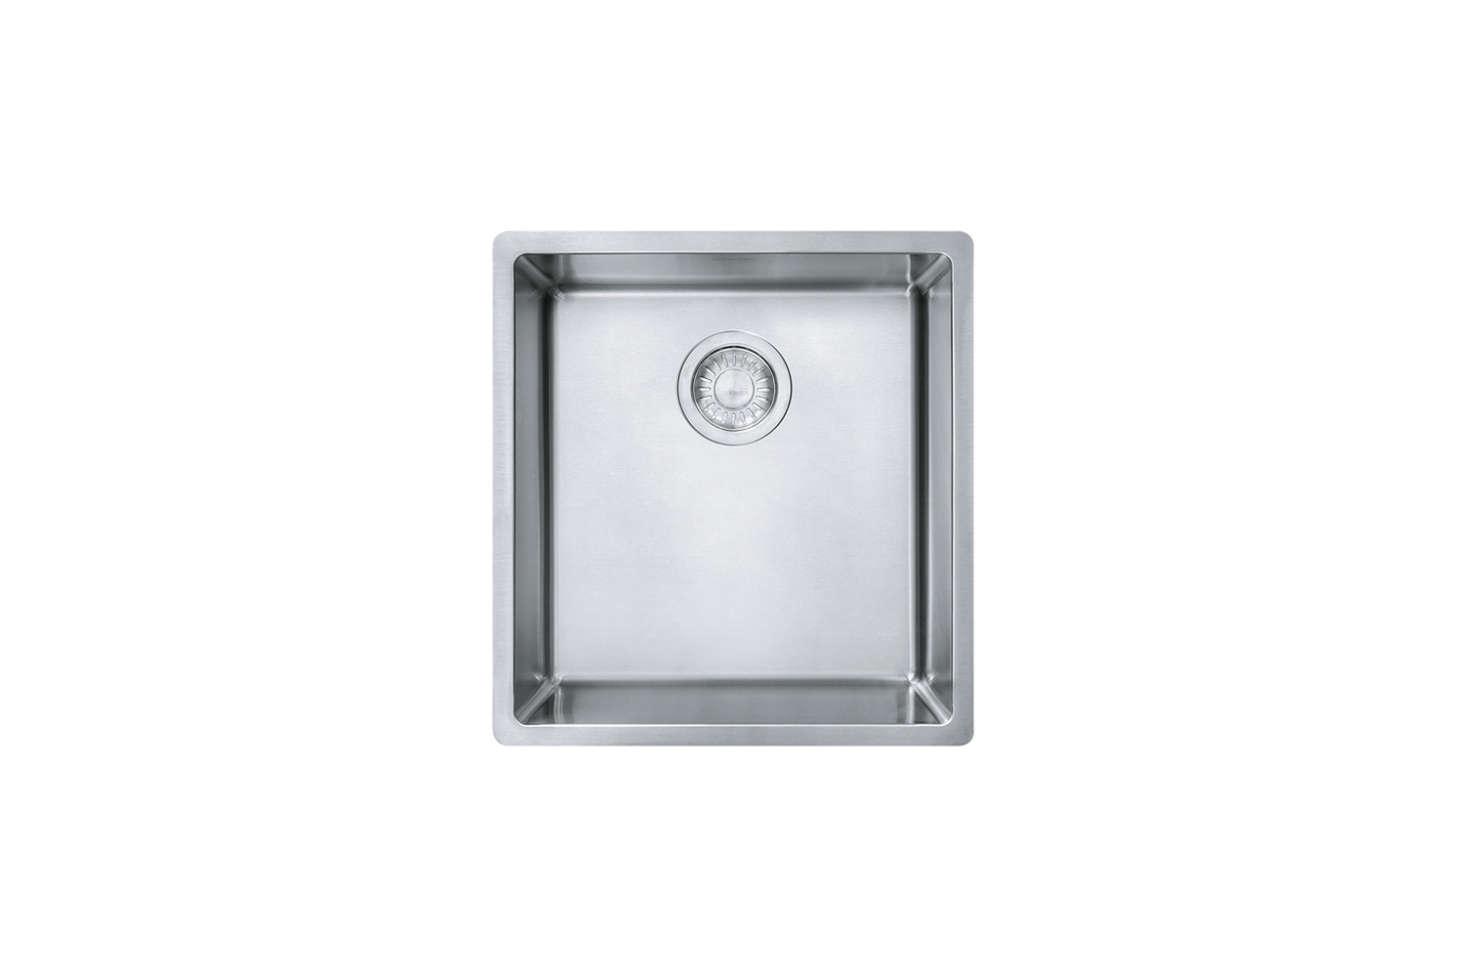 The Franke Cube Undermount Bar Sink (FCUXsrc=